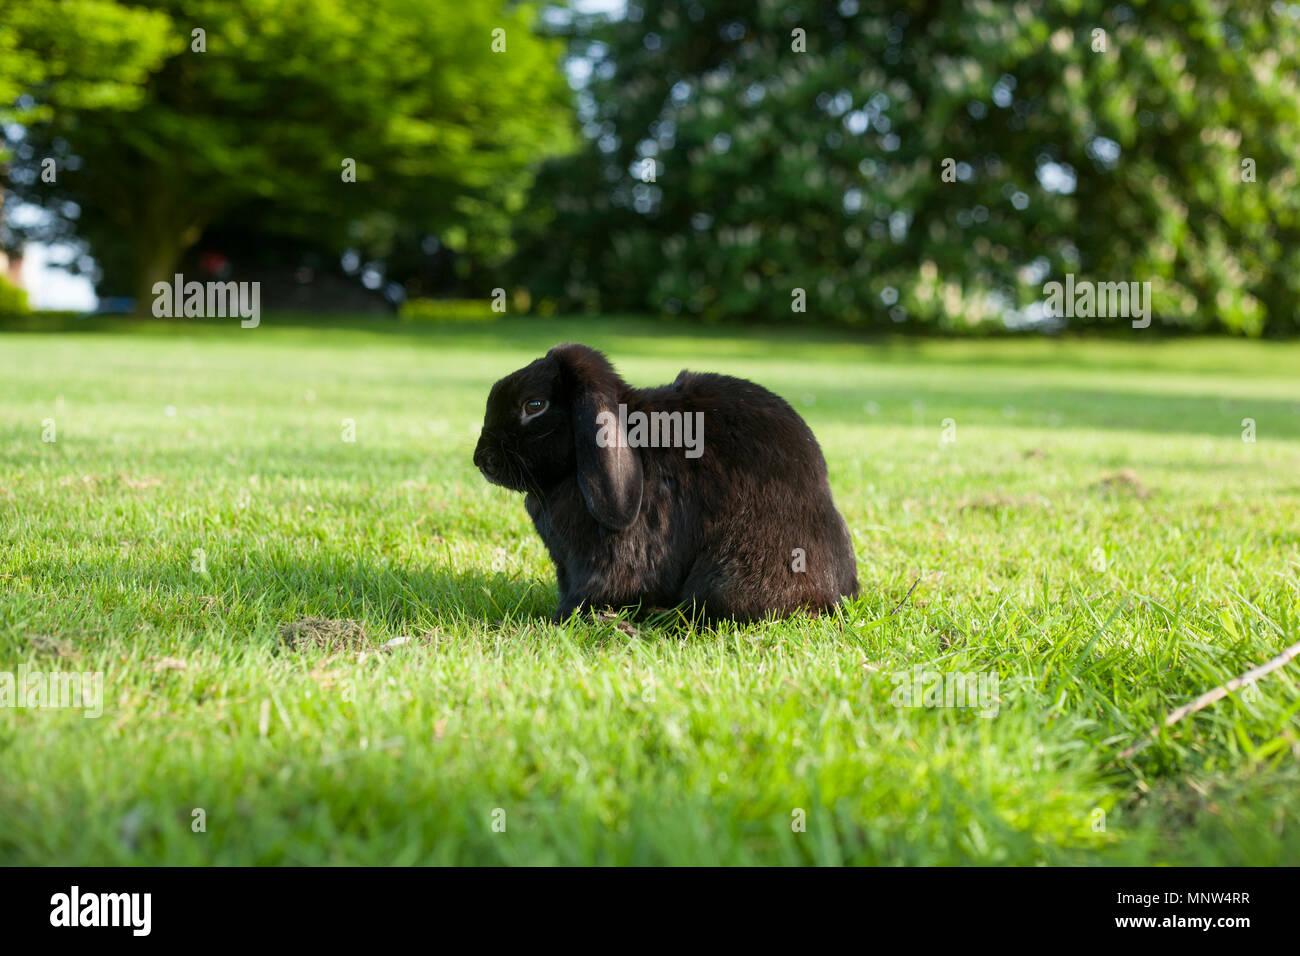 Lop Rabbit - Stock Image